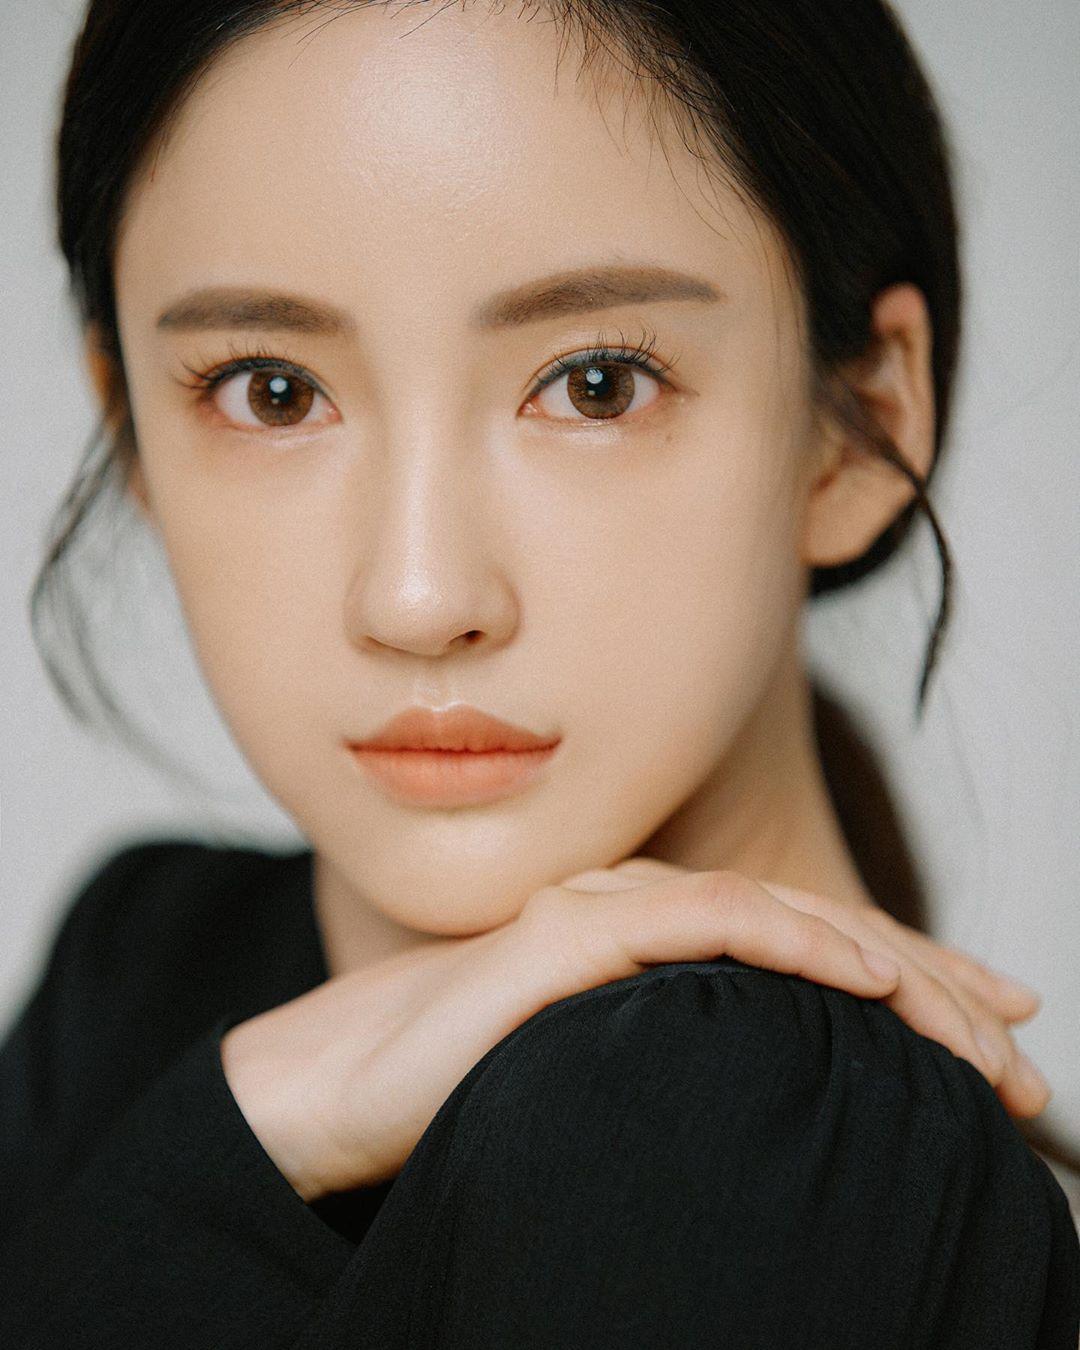 Seojin-Ban-Wallpapers-Insta-Fit-Bio-5